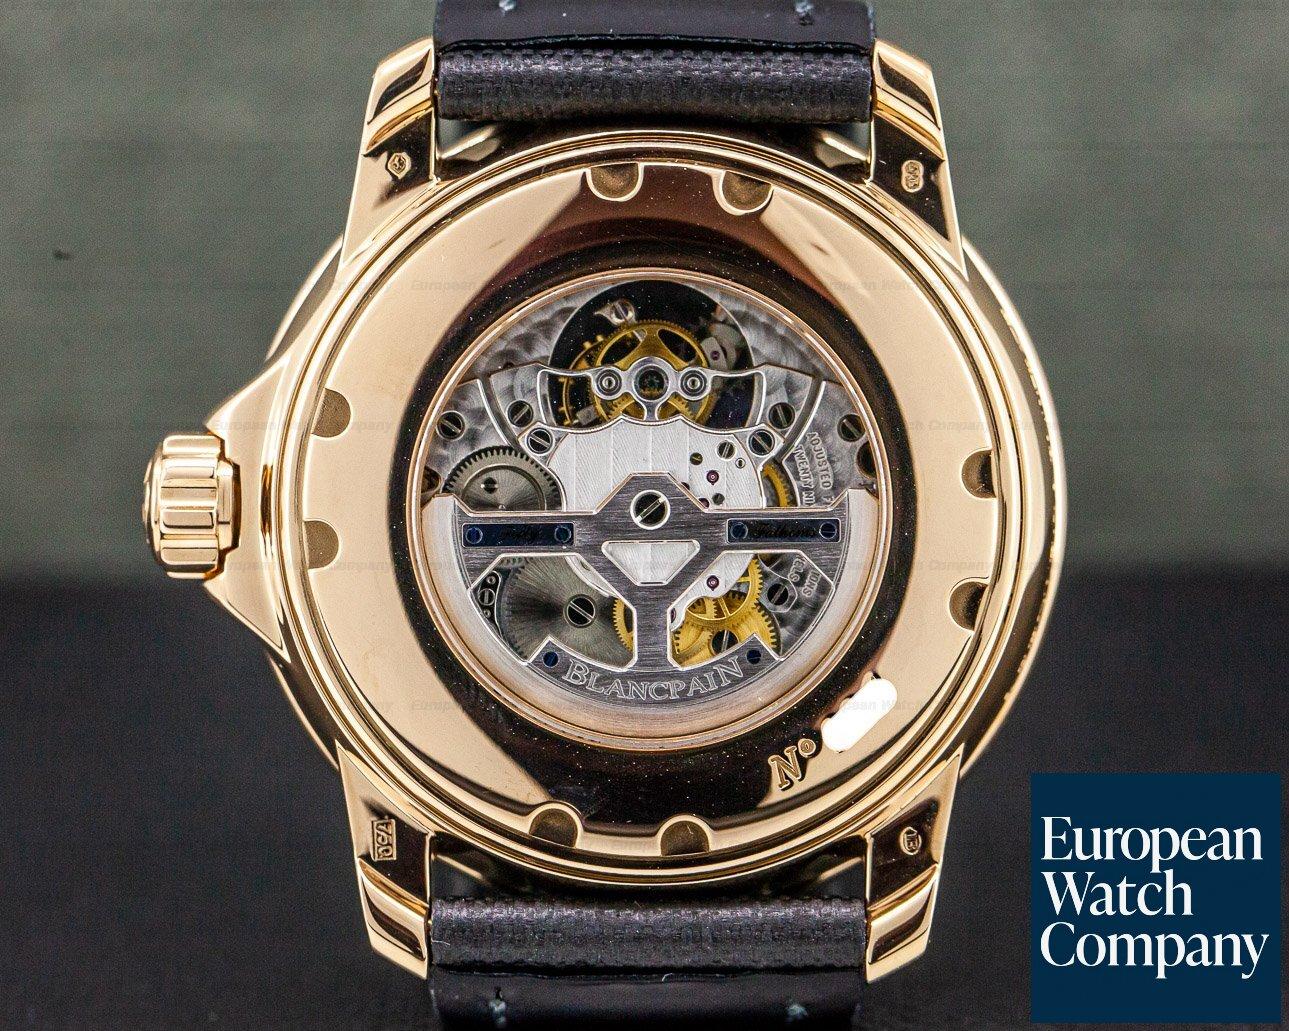 Blancpain 5025-3630-52A Fifty Fathoms 8-Day Tourbillon 18K Rose Gold / Kevlar